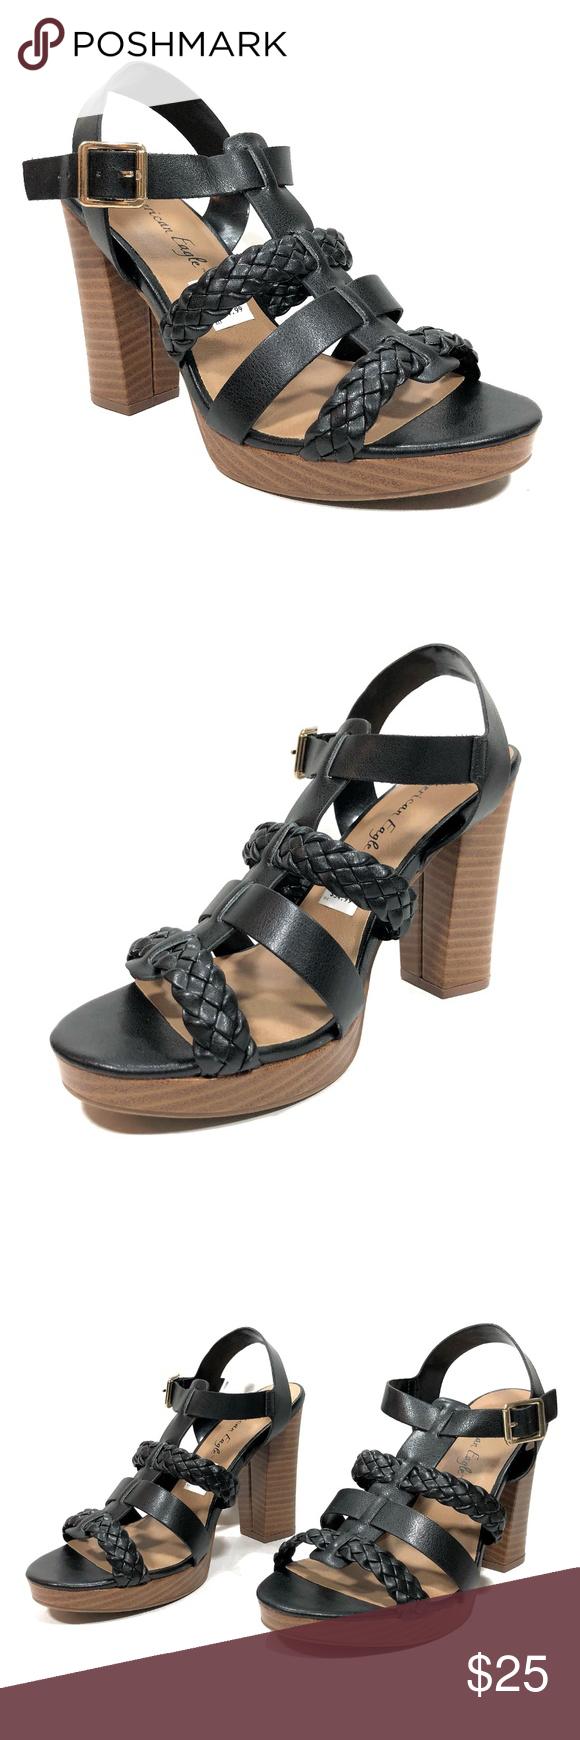 62c1e31e9251 Women s Blake Platform Sandal Black